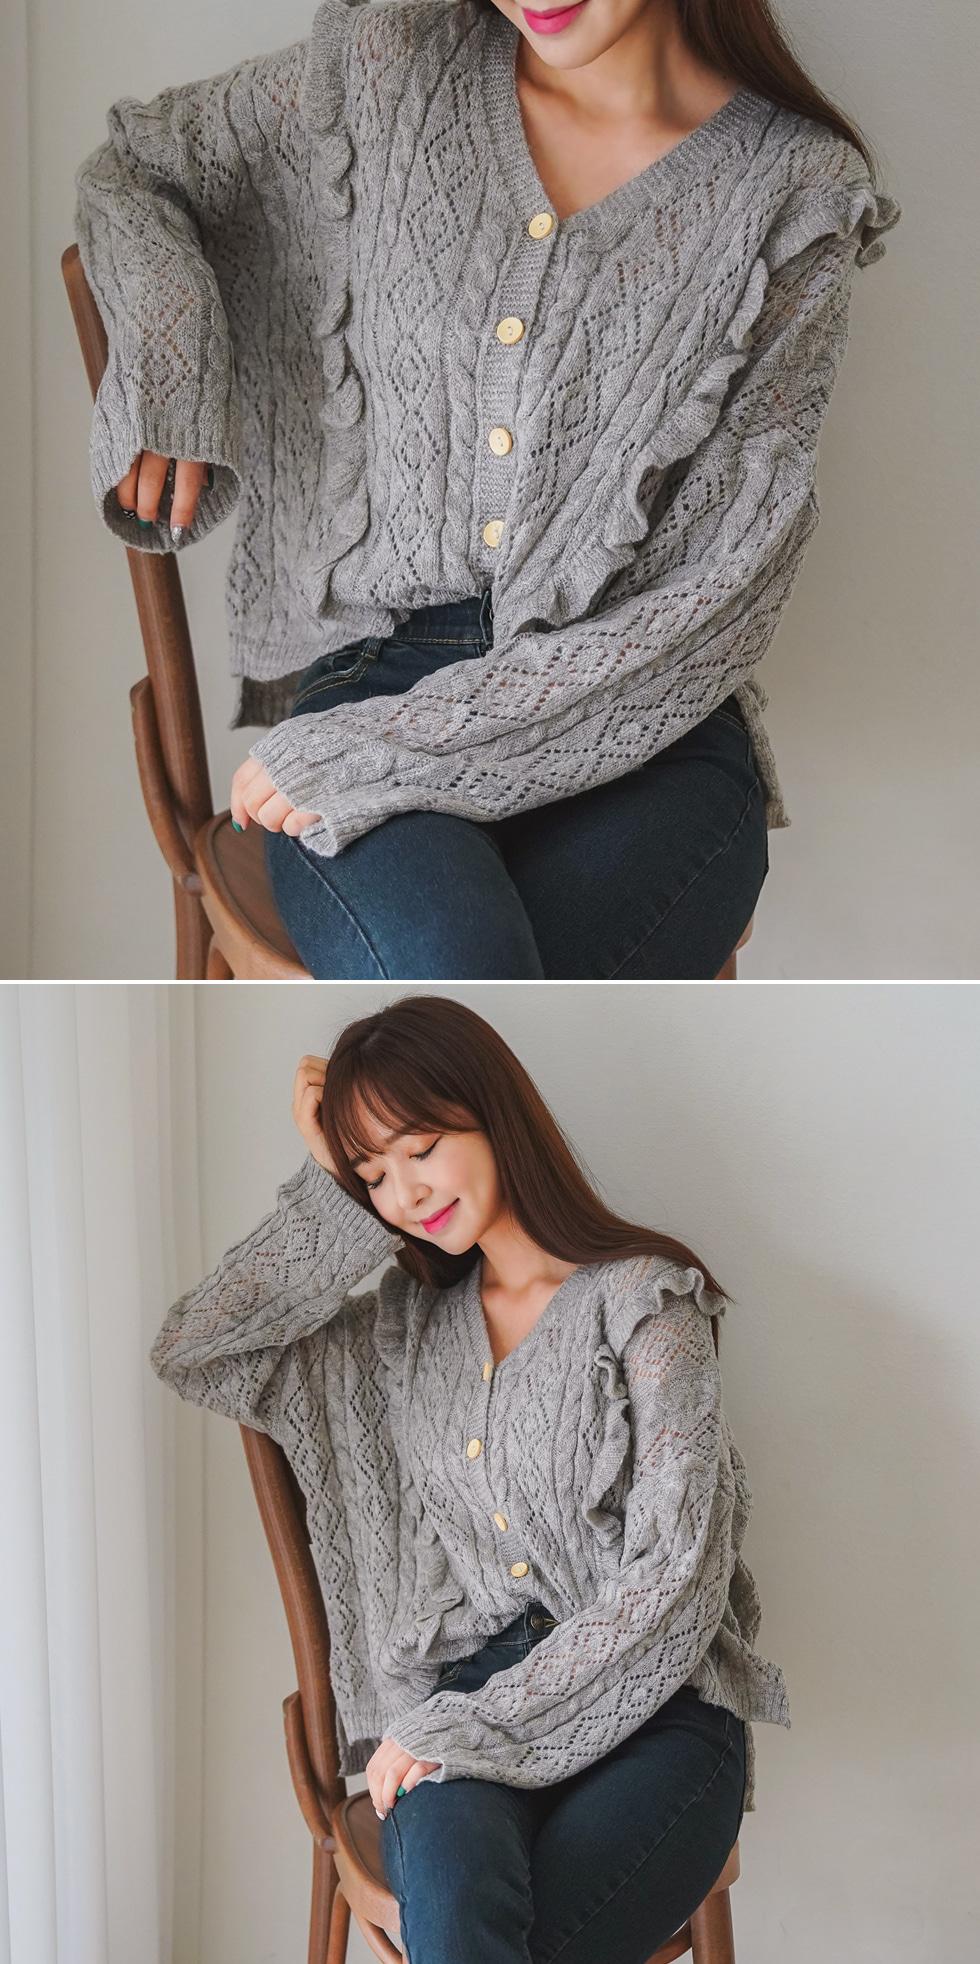 Grooming knit cardigan